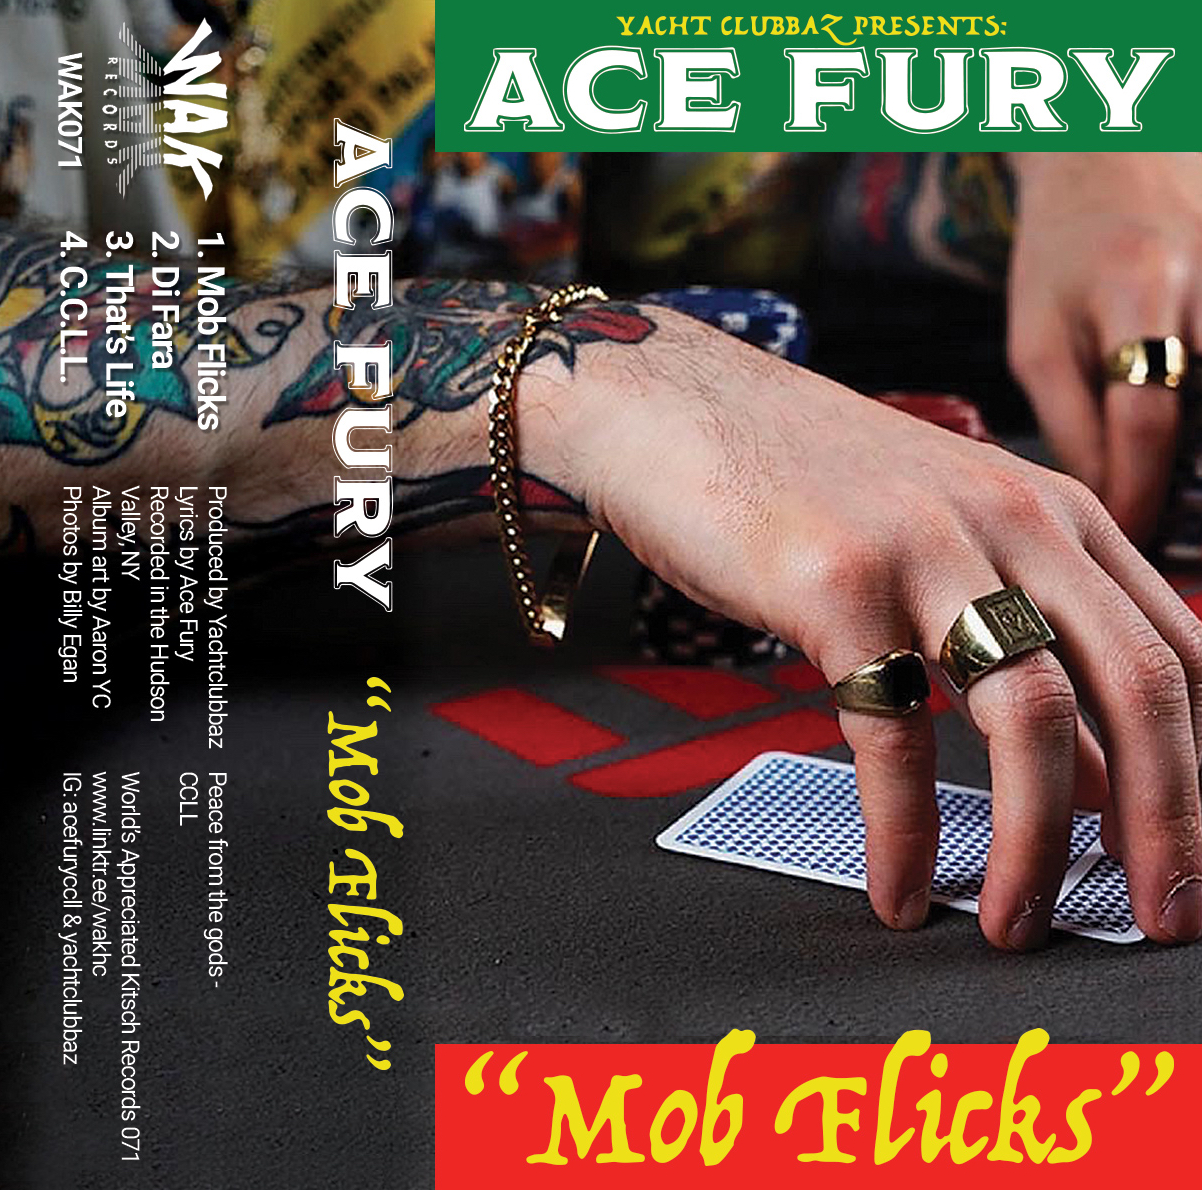 Ace Fury - Mob flicks CS